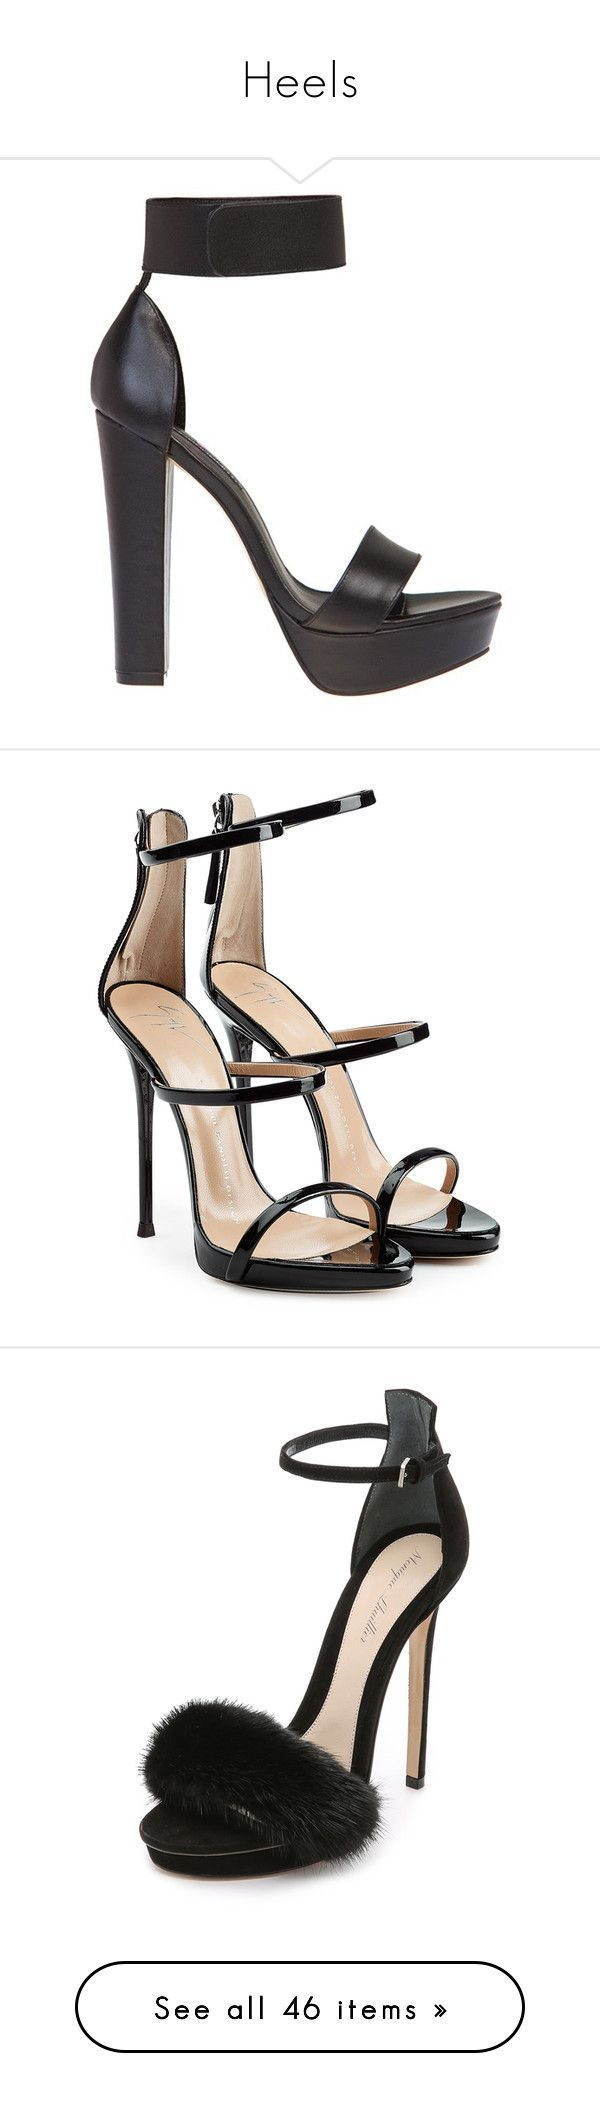 """Heels"" by isthelastofus ❤ liked on Polyvore featuring shoes, heels, high heels, sandals, ankle strap shoes, ankle strap platform shoes, windsor smith shoes, high heel platform shoes, ankle tie shoes and giuseppe zanotti #giuseppezanottiheelssandals #platformhighheelsanklestraps"